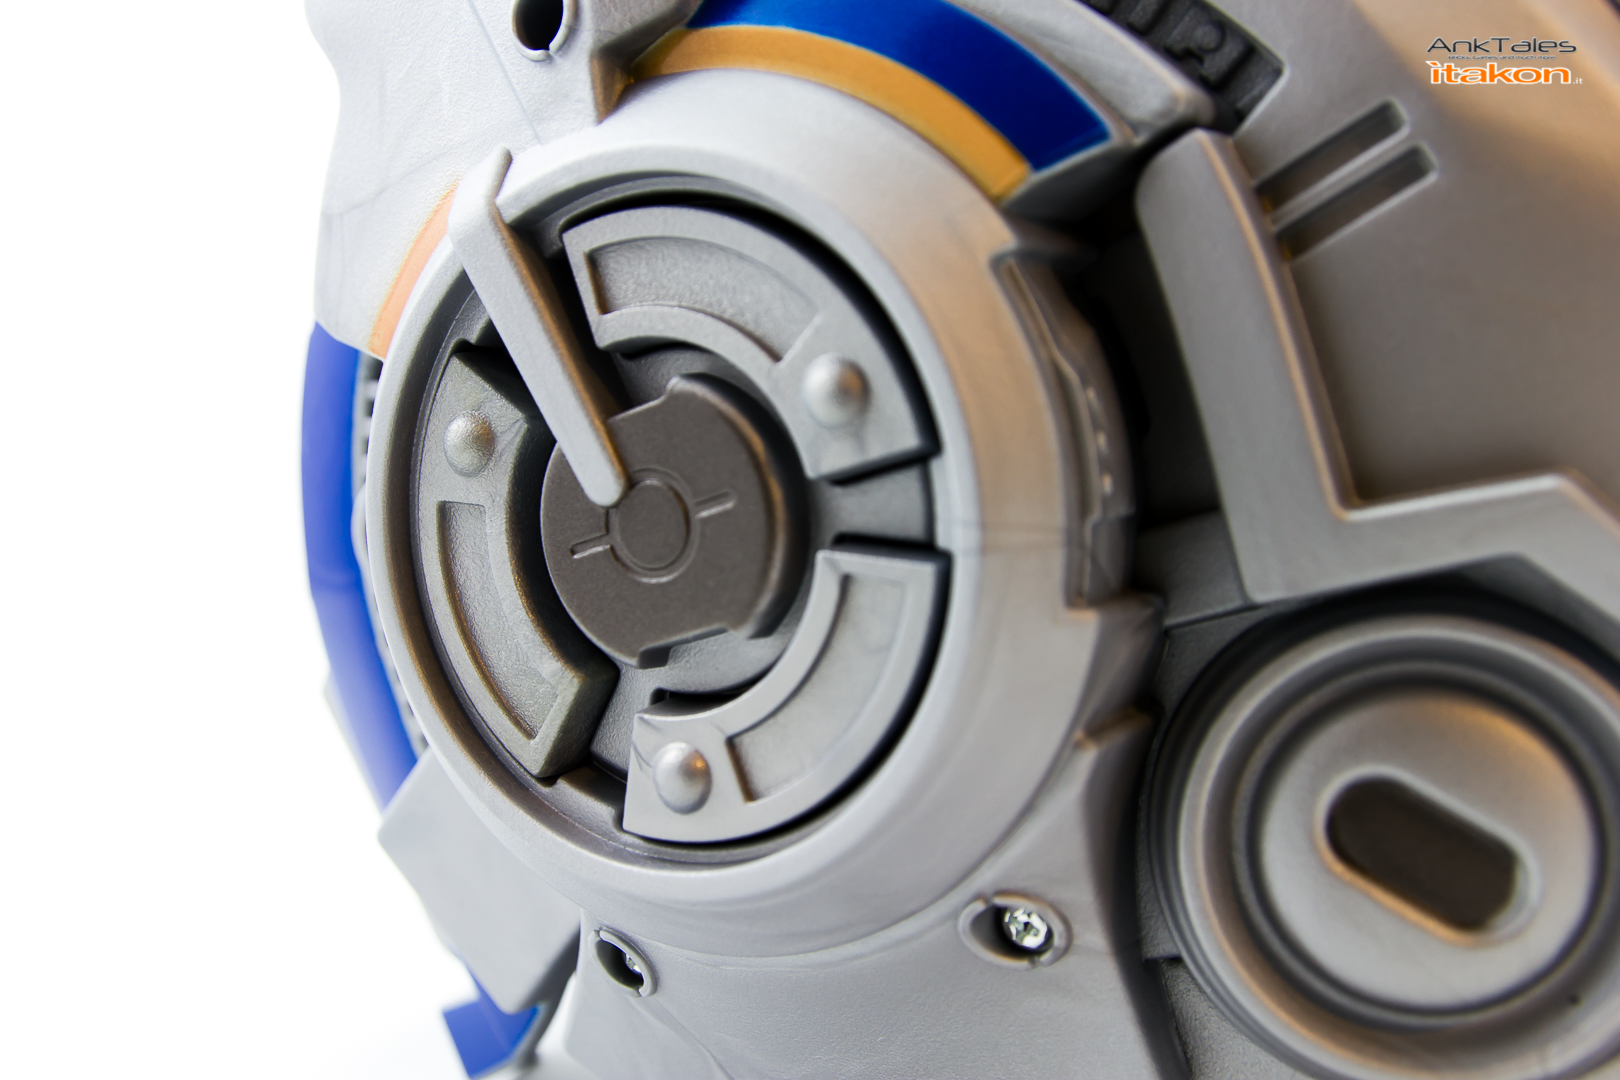 Link a Hasbro Optimus Prime helmet Anktales Itakon_0029